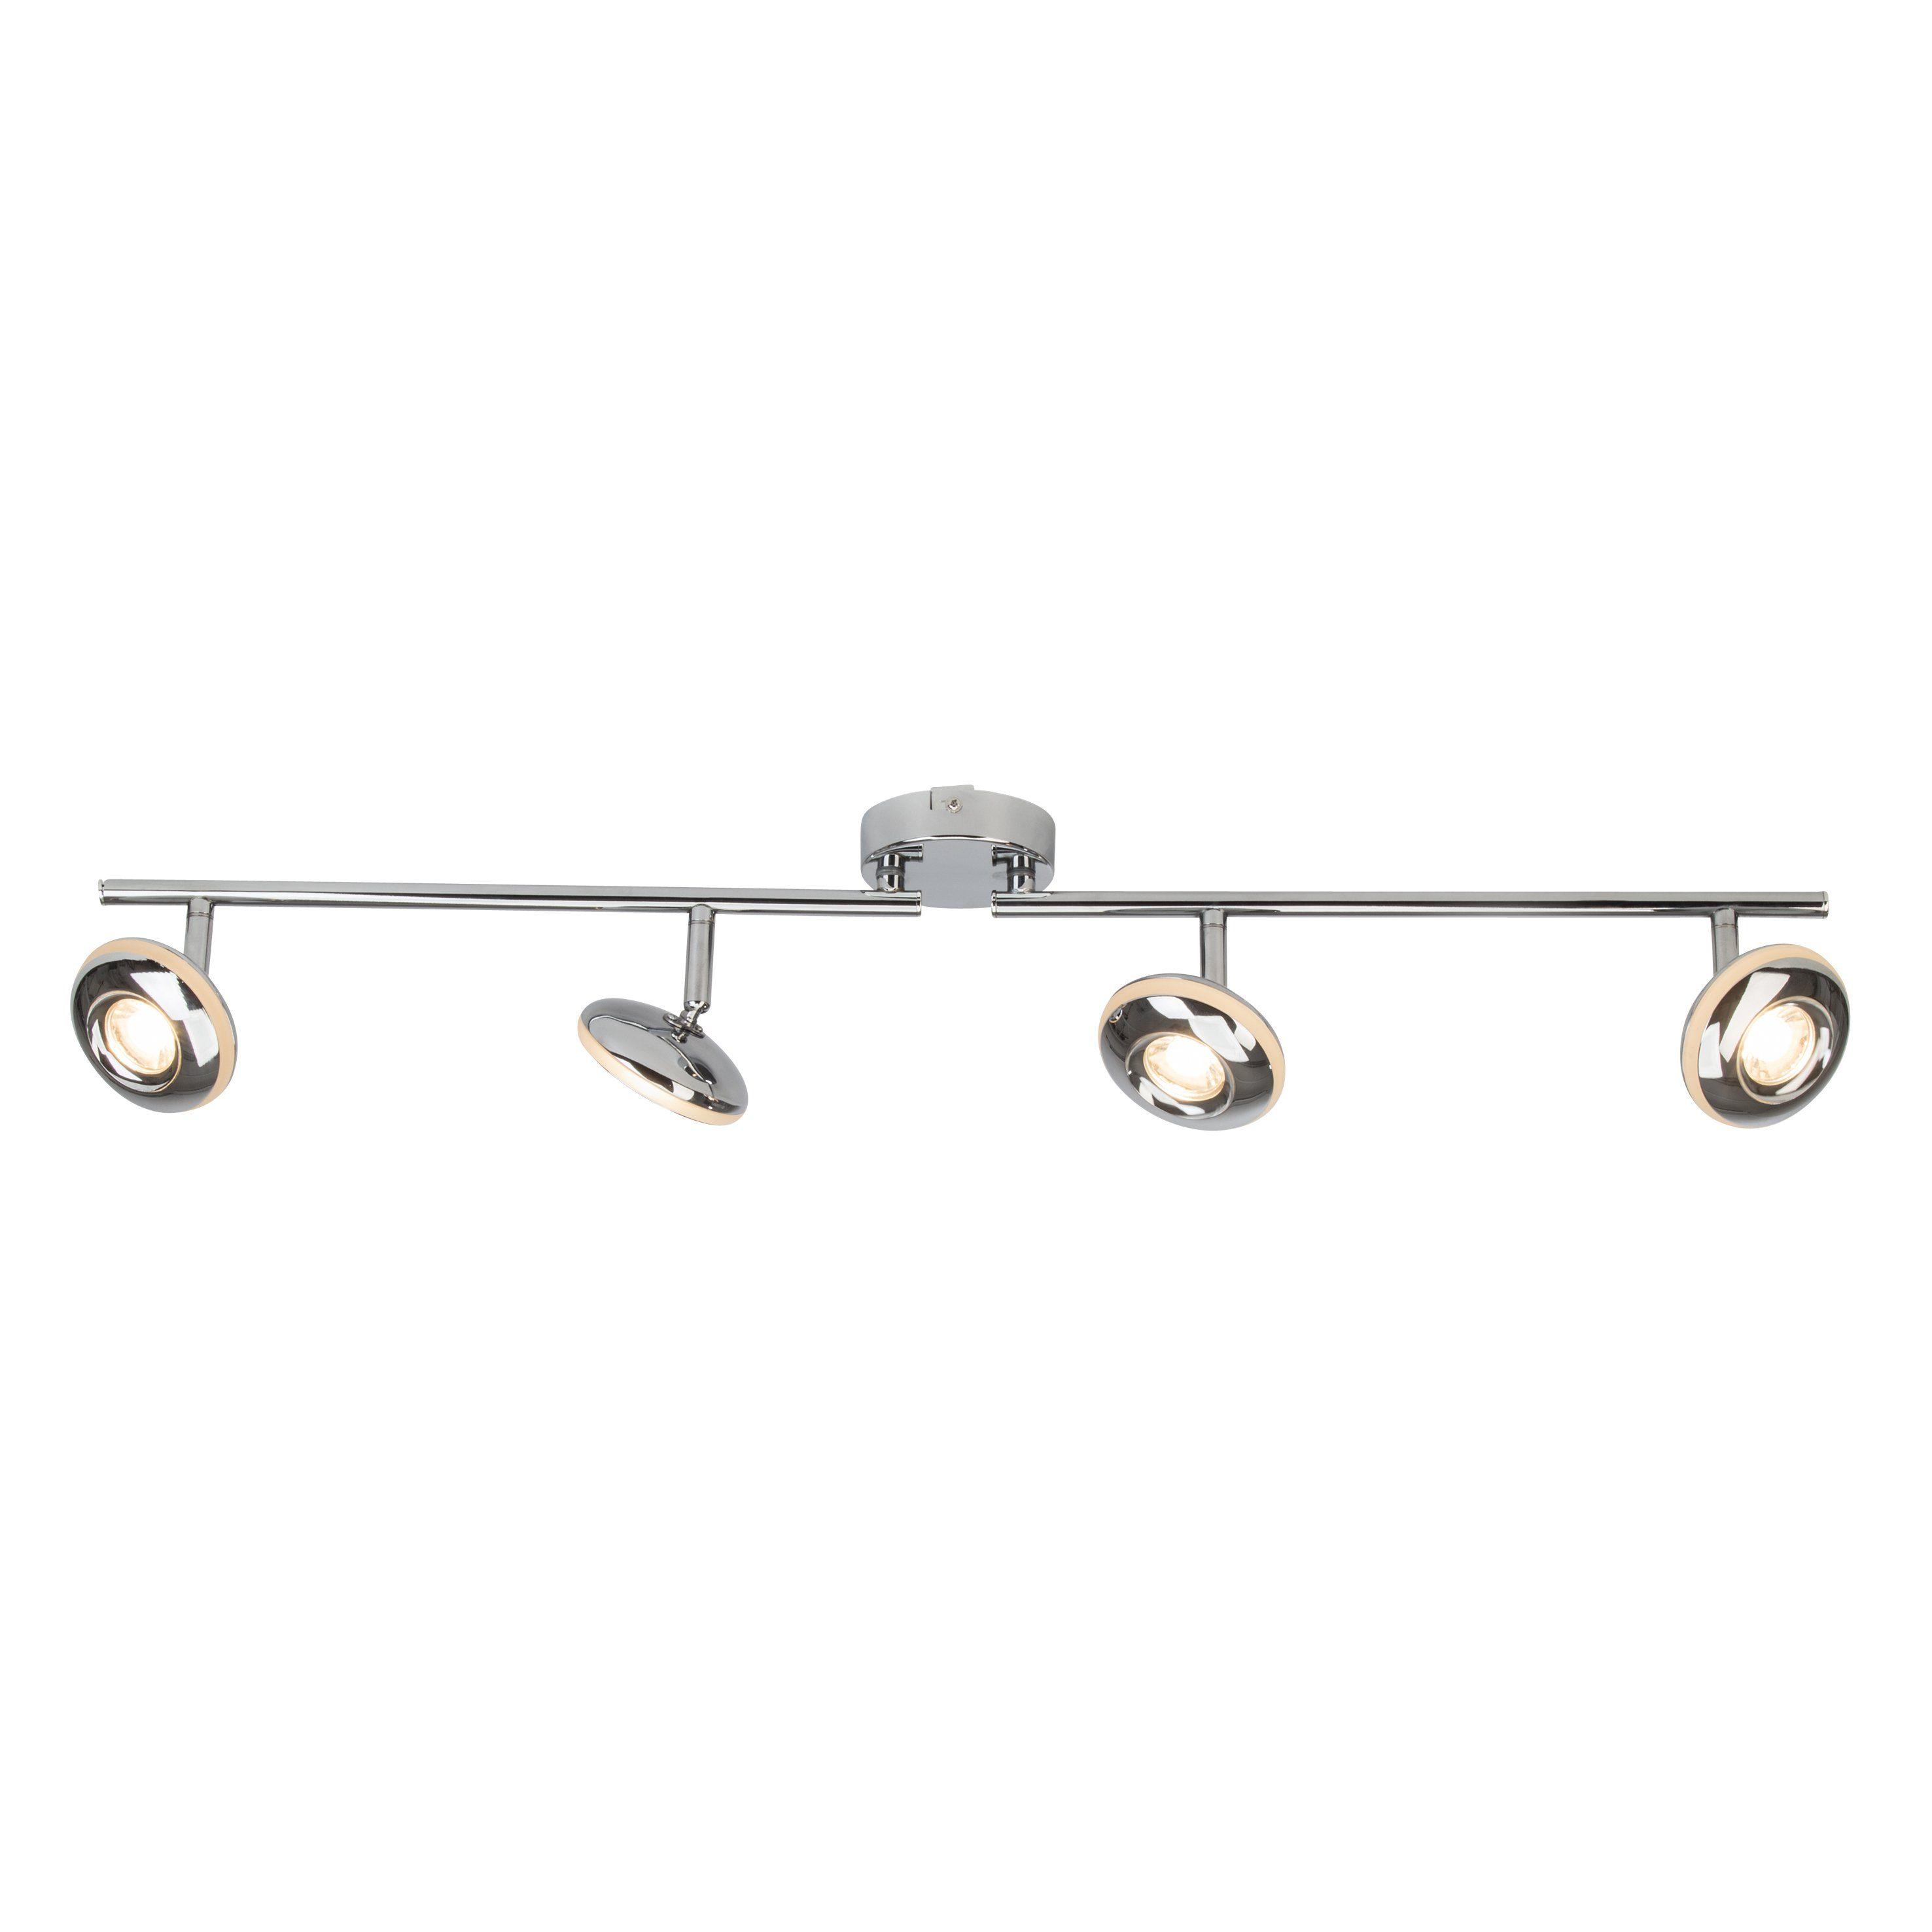 Brilliant Leuchten More LED Spotrohr, 4-flammig chrom